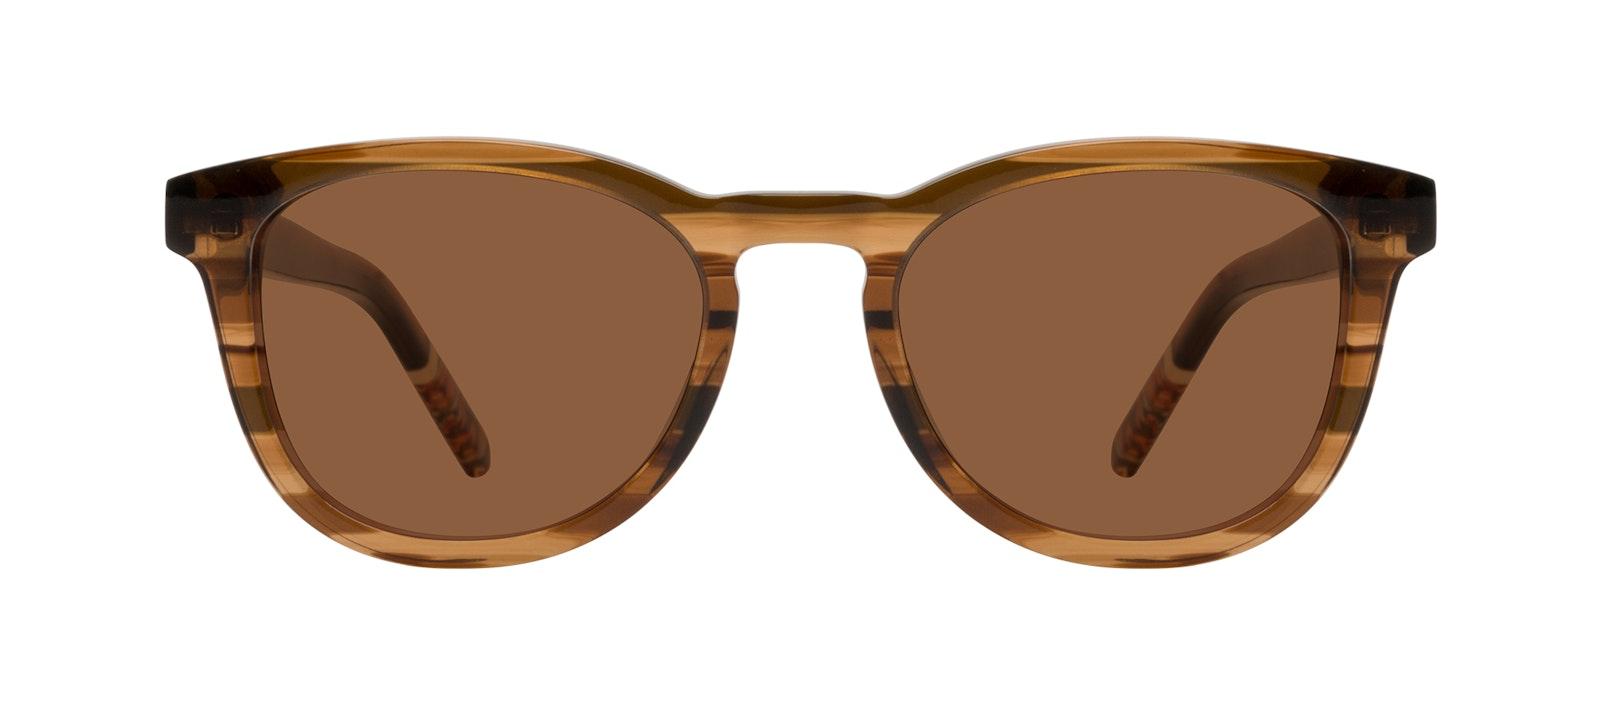 Affordable Fashion Glasses Round Sunglasses Men Goal Smokey Havana Front